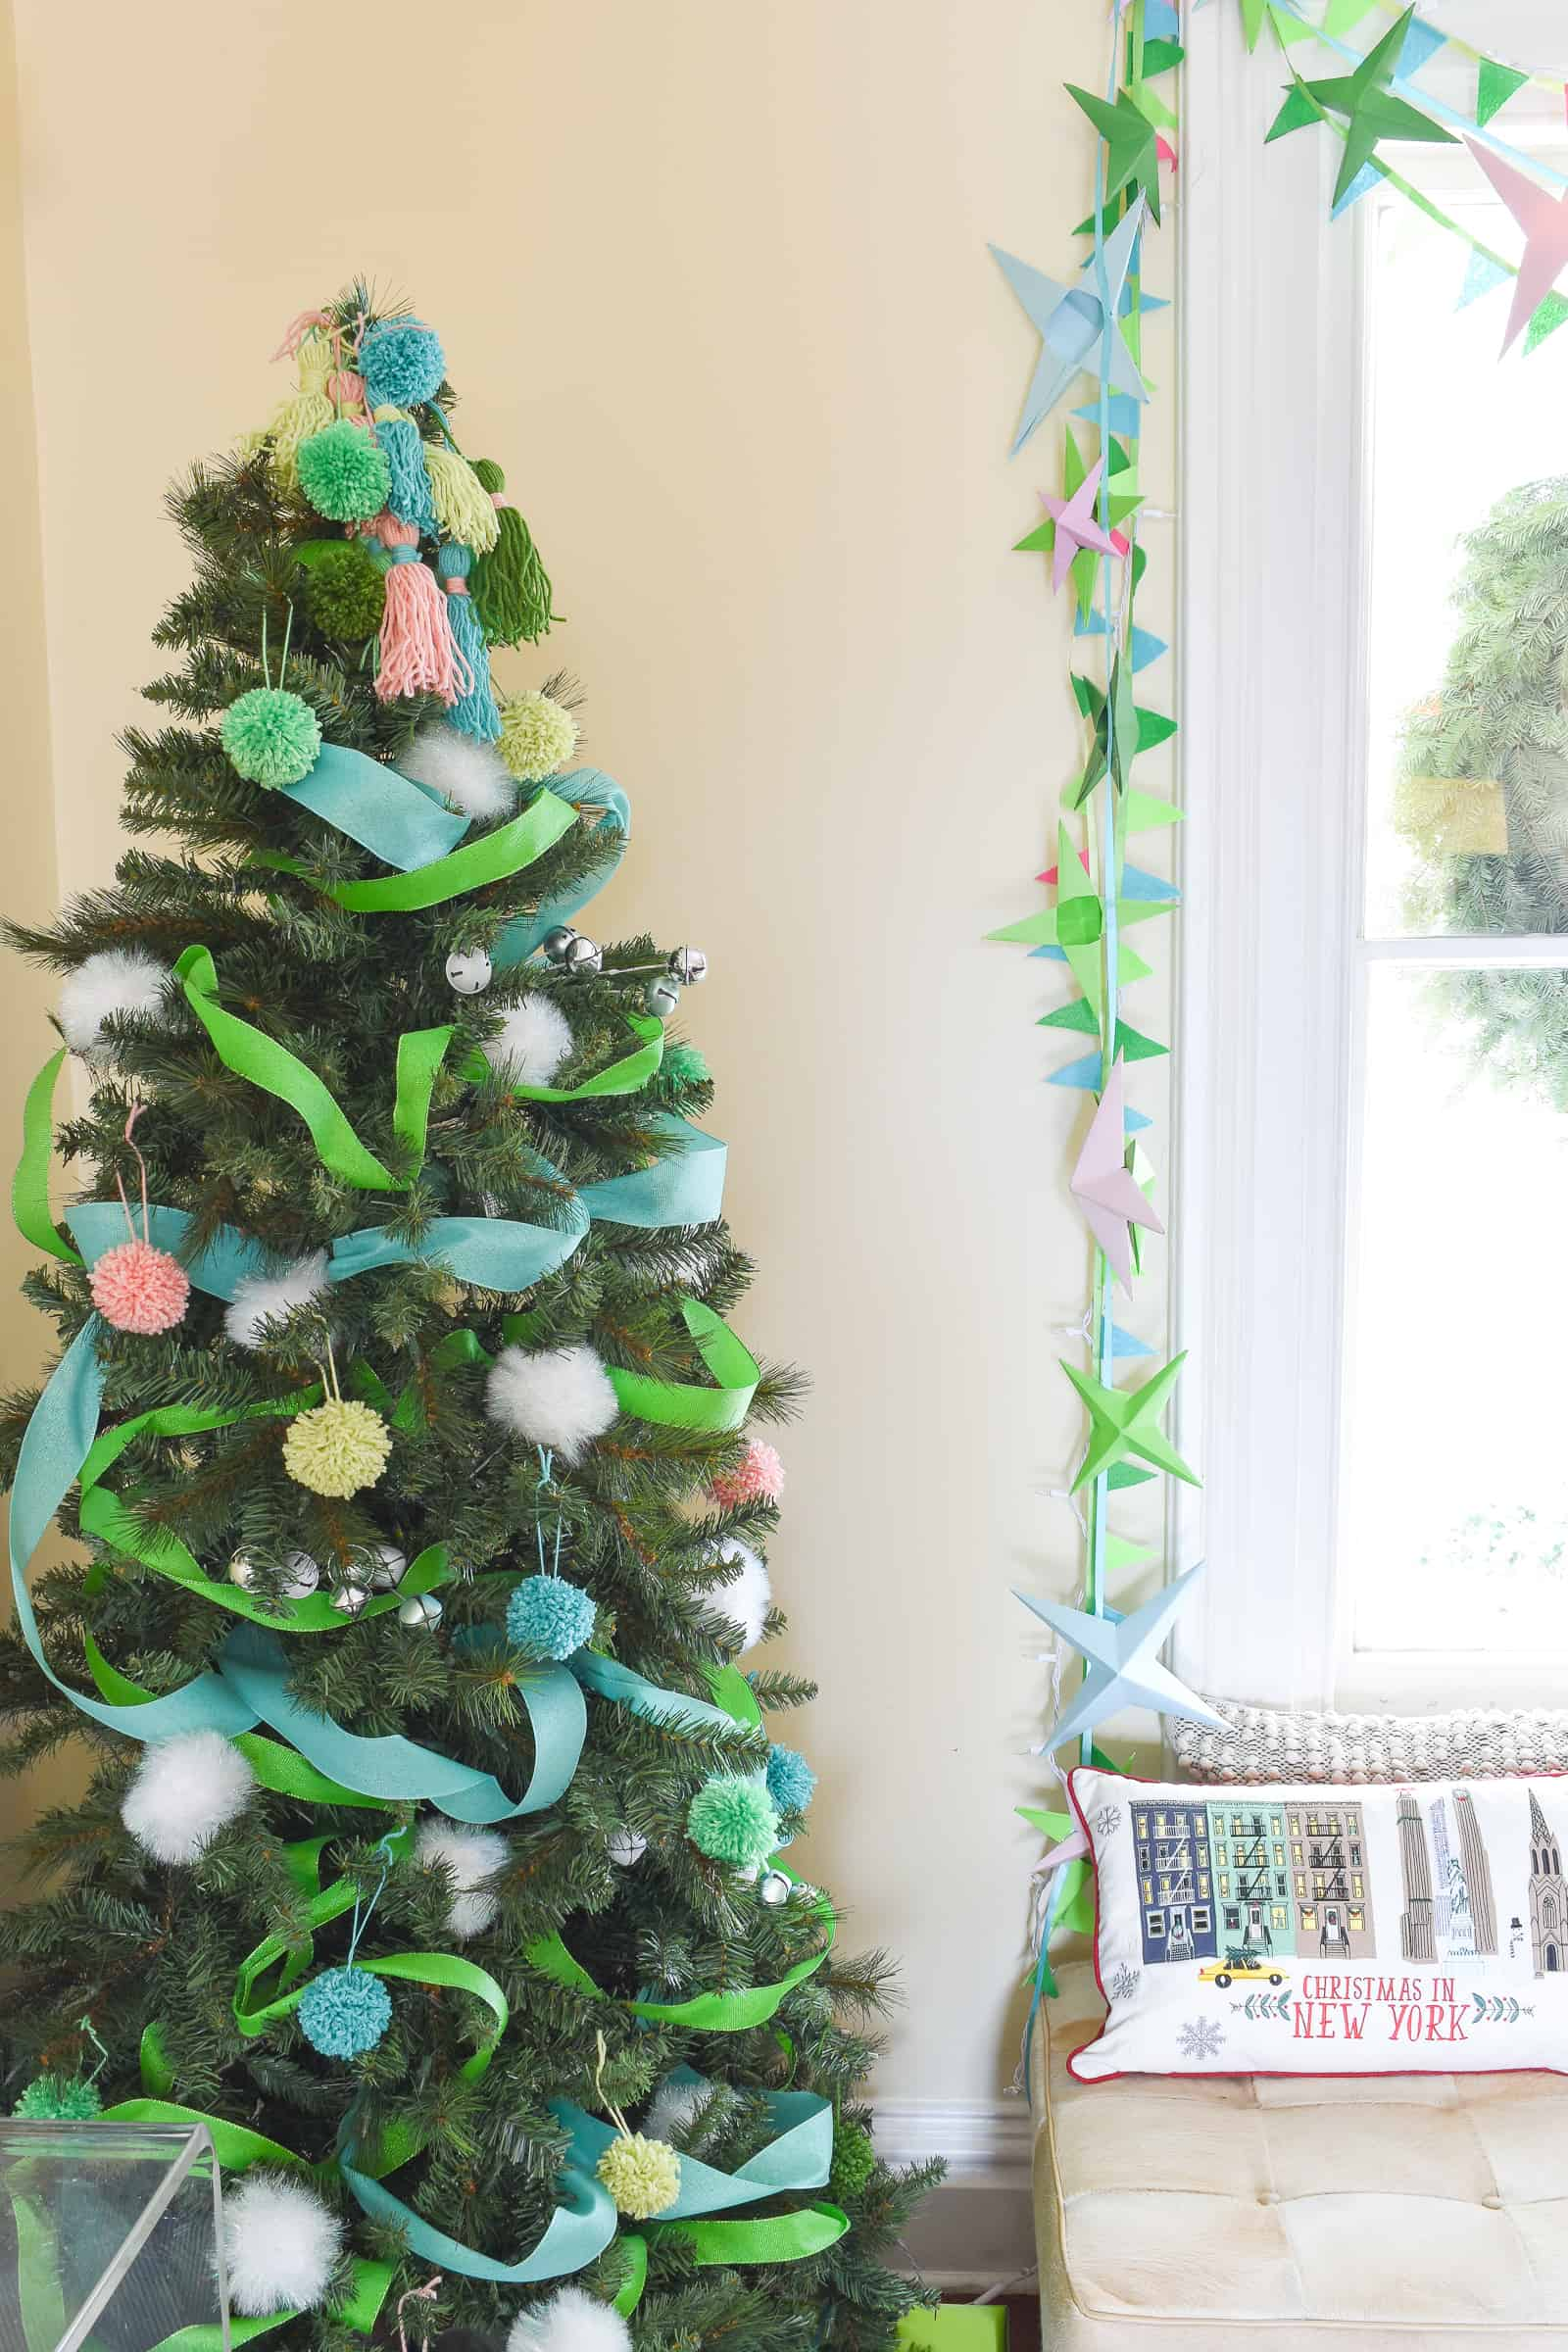 Retro Decor for Santa\'s House - At Charlotte\'s House